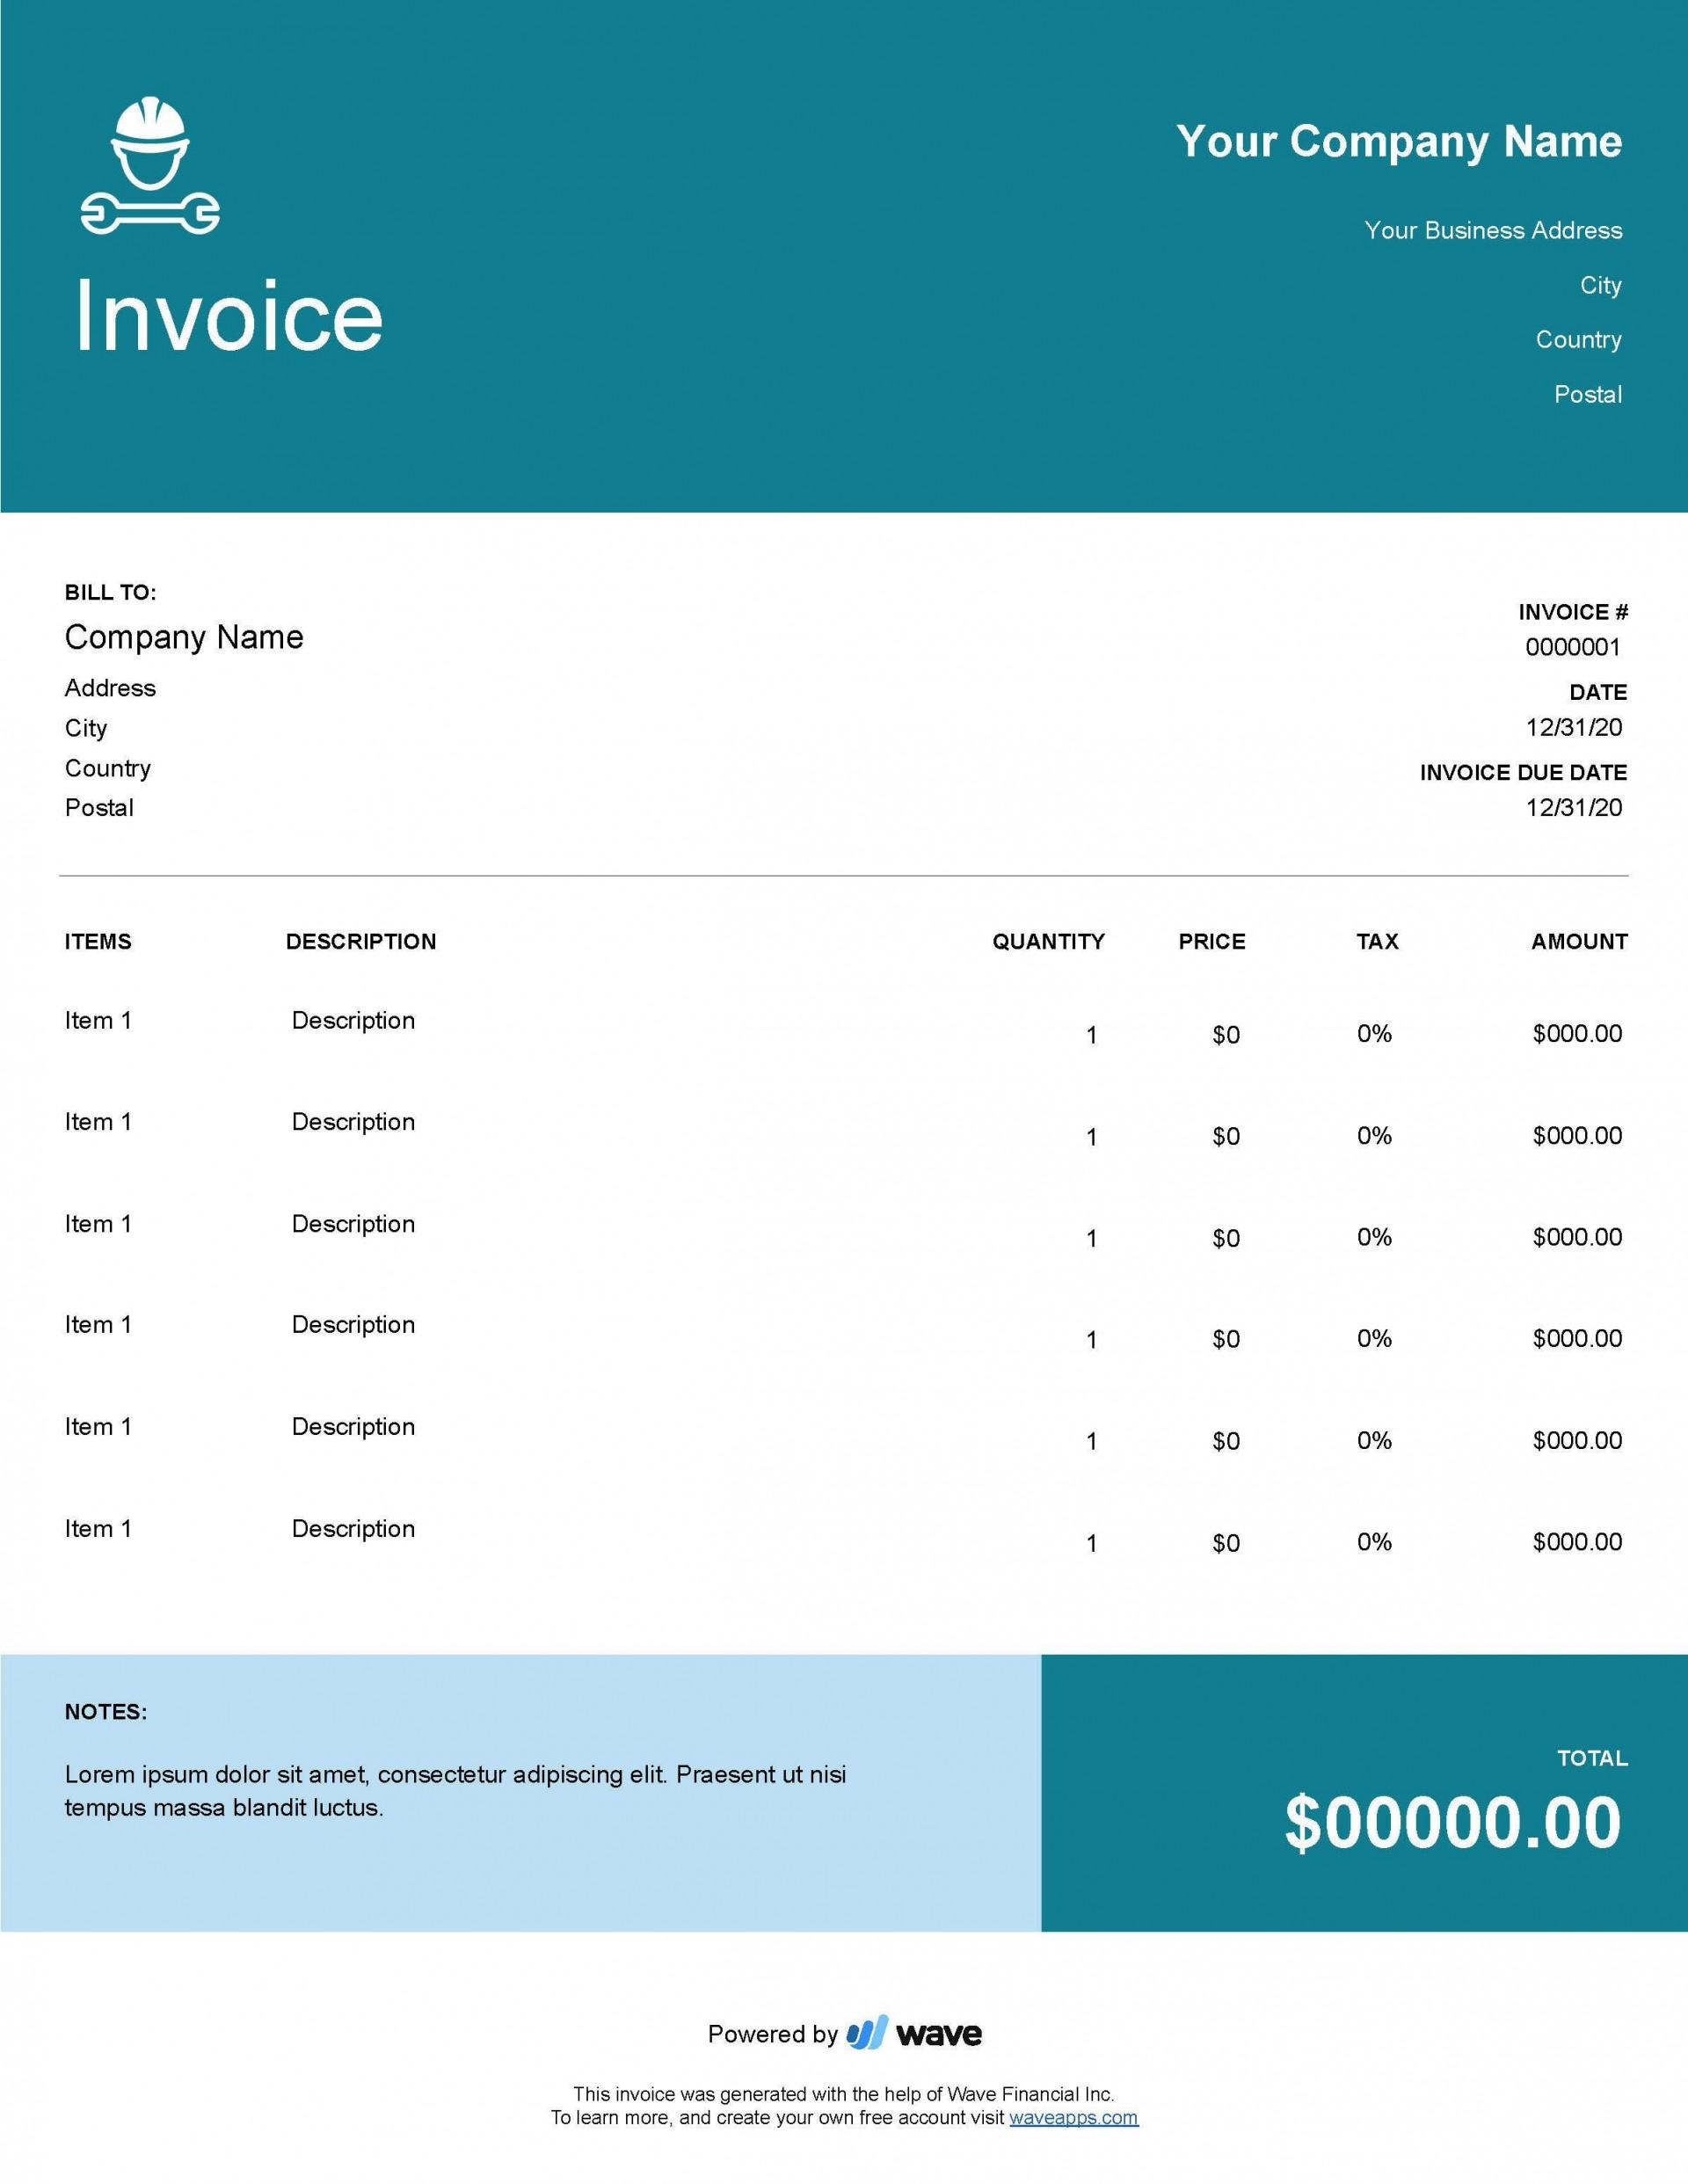 001 Imposing Google Drive Invoice Template Image  Receipt1920